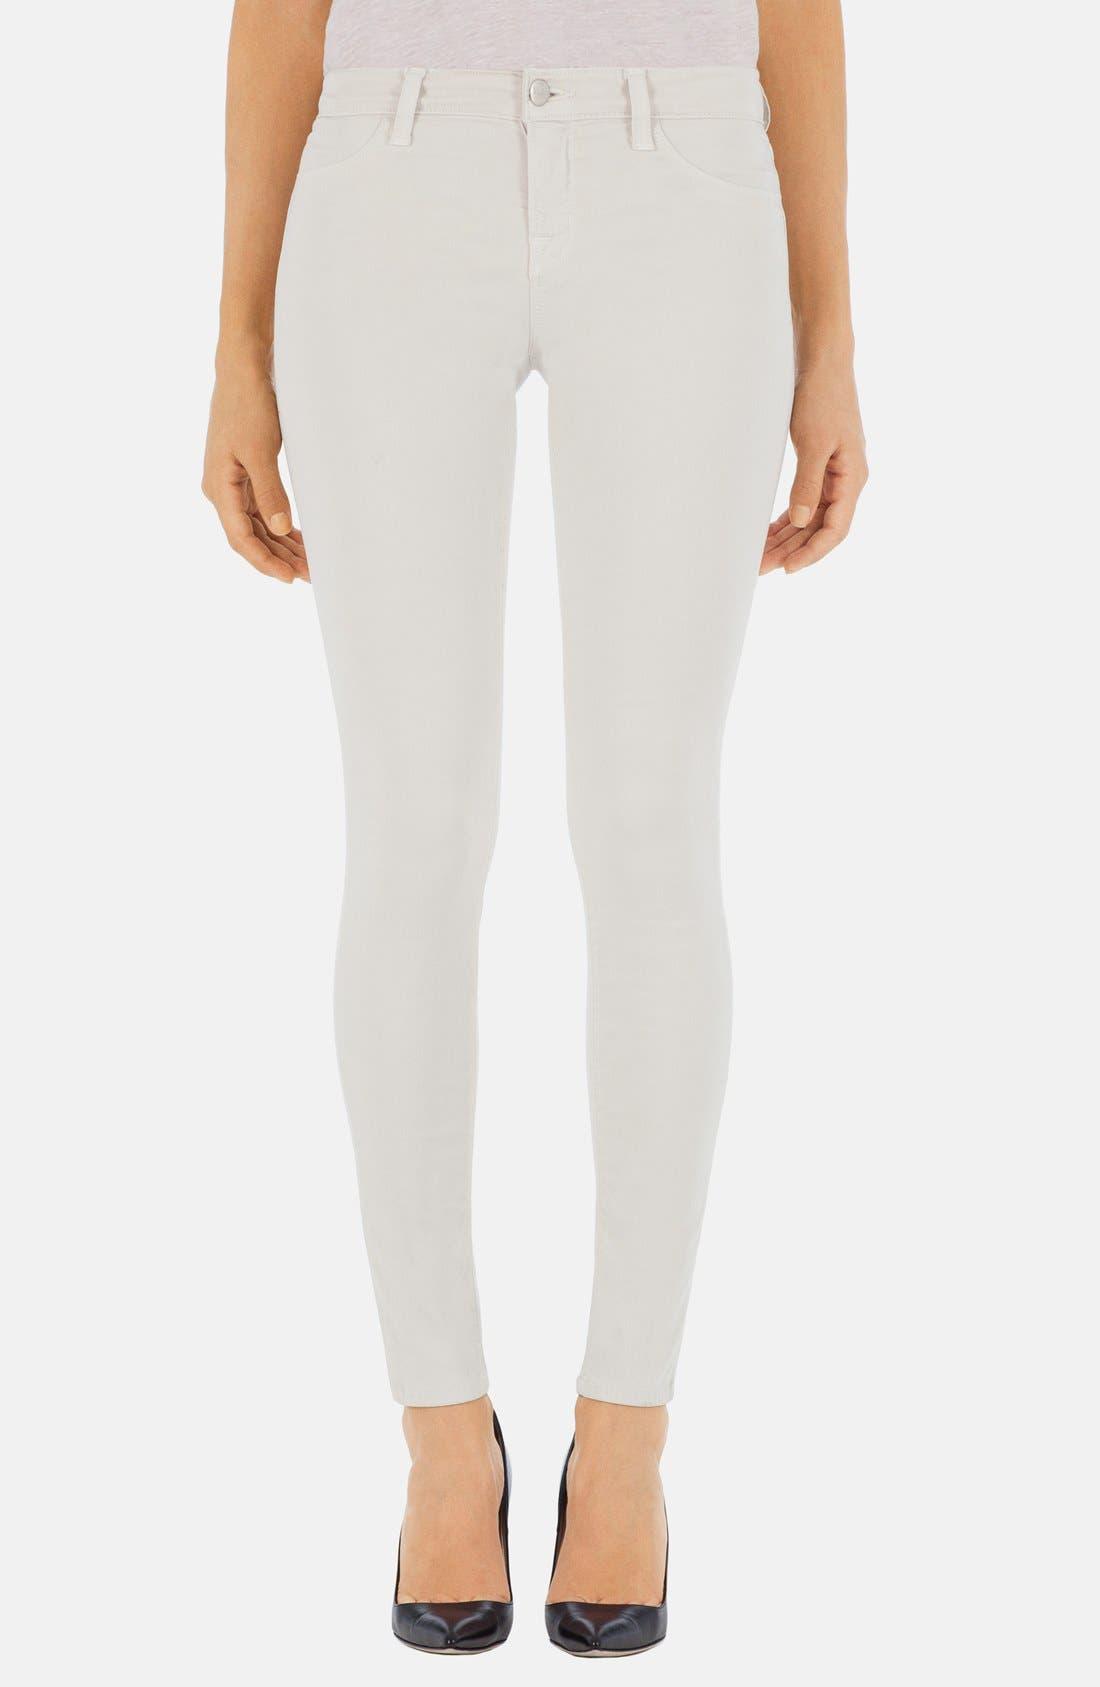 Alternate Image 1 Selected - J Brand '485' Mid Rise Super Skinny Jeans (Chalk)